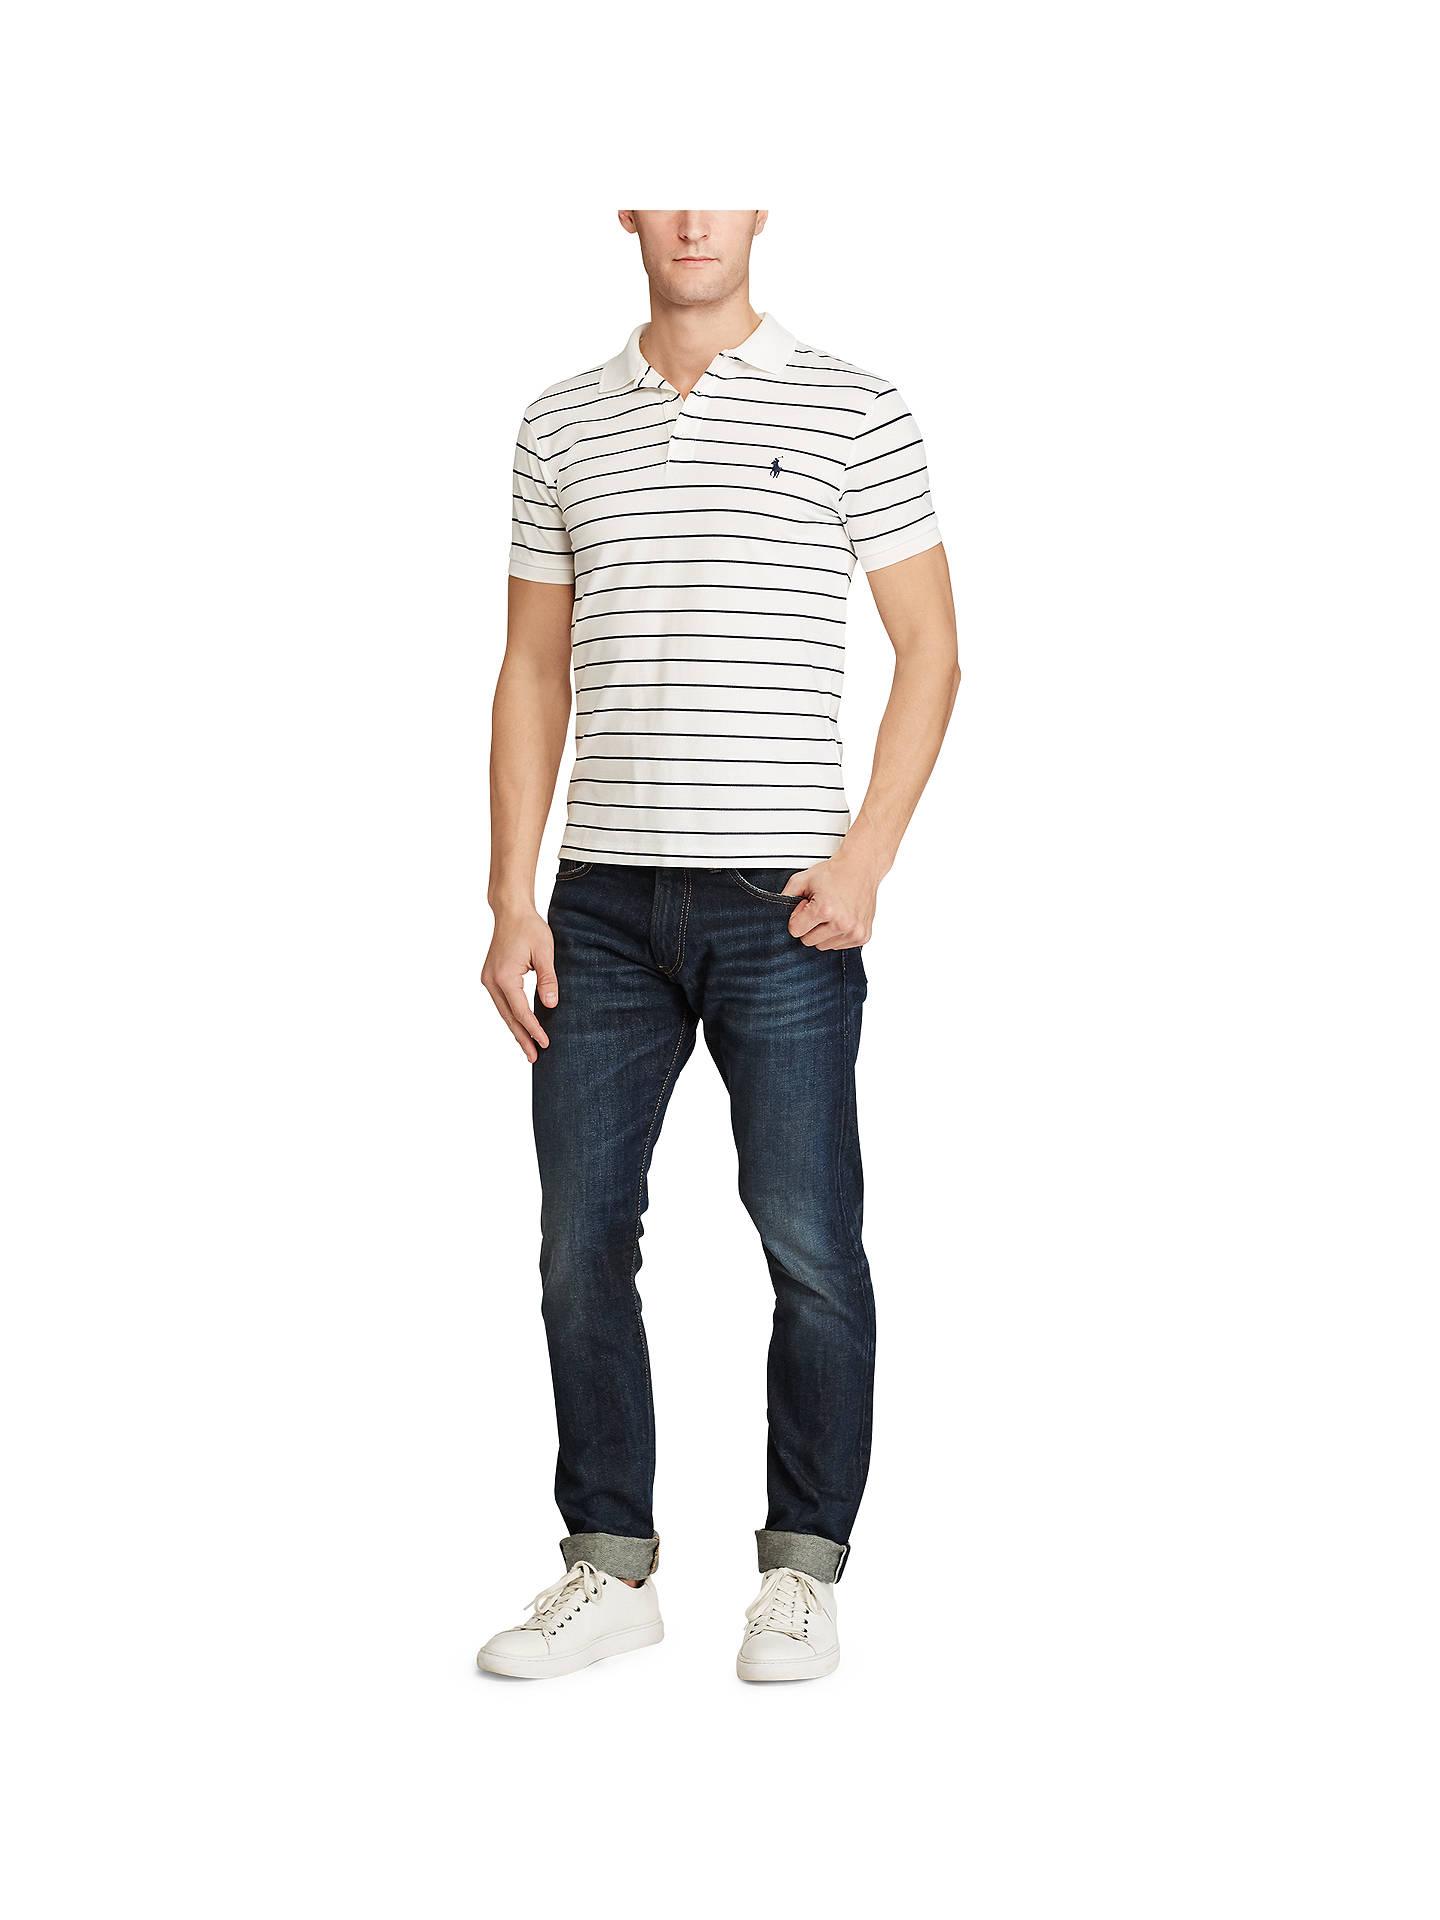 8718f400a ... Buy Polo Ralph Lauren Striped Slim Fit Stretch Cotton Mesh Polo Shirt